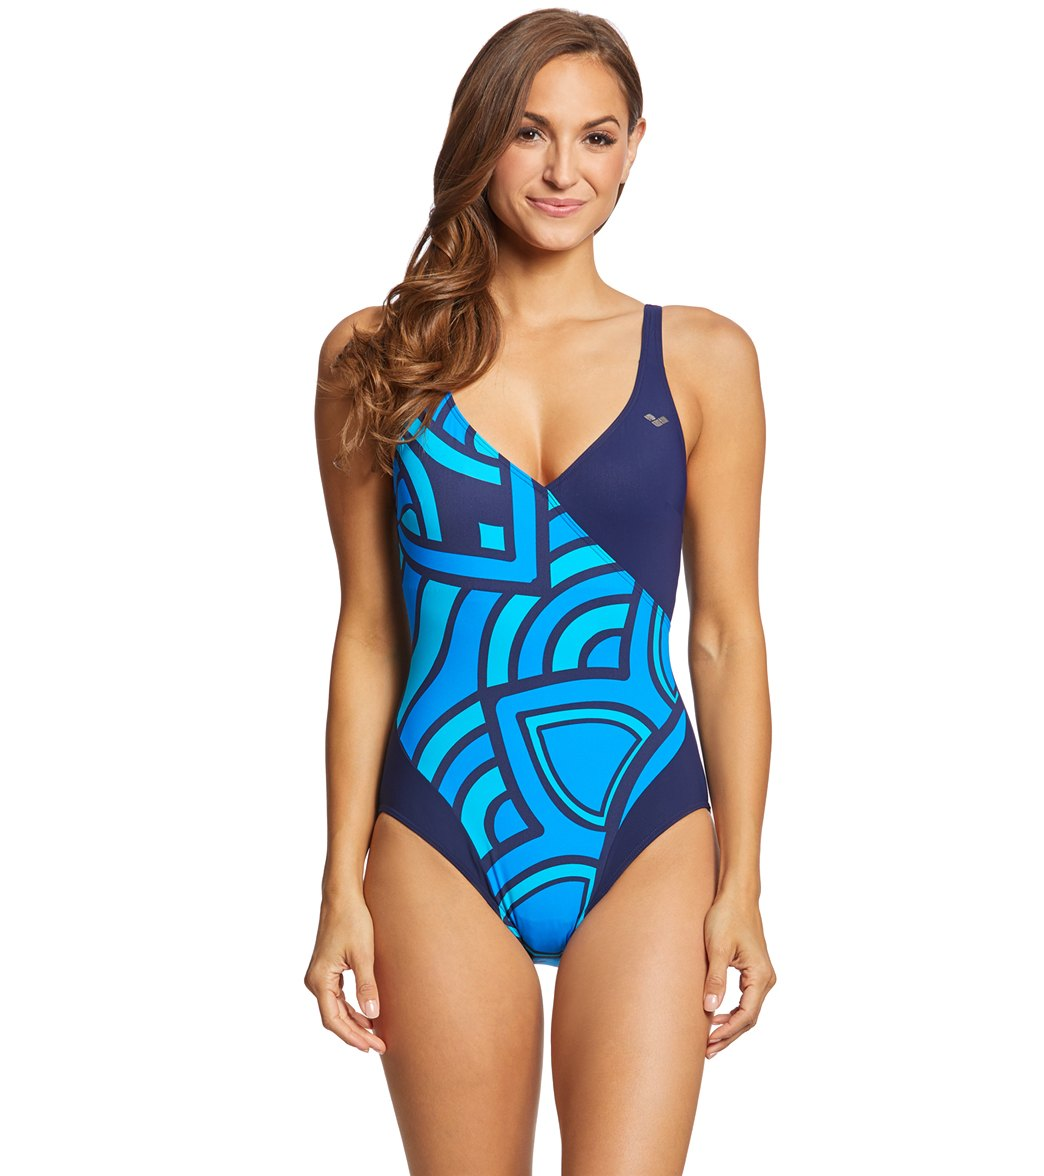 e6113109b803f Arena Women s Bodylift Jade U Back Shapewear One Piece Swimsuit at  SwimOutlet.com - Free Shipping